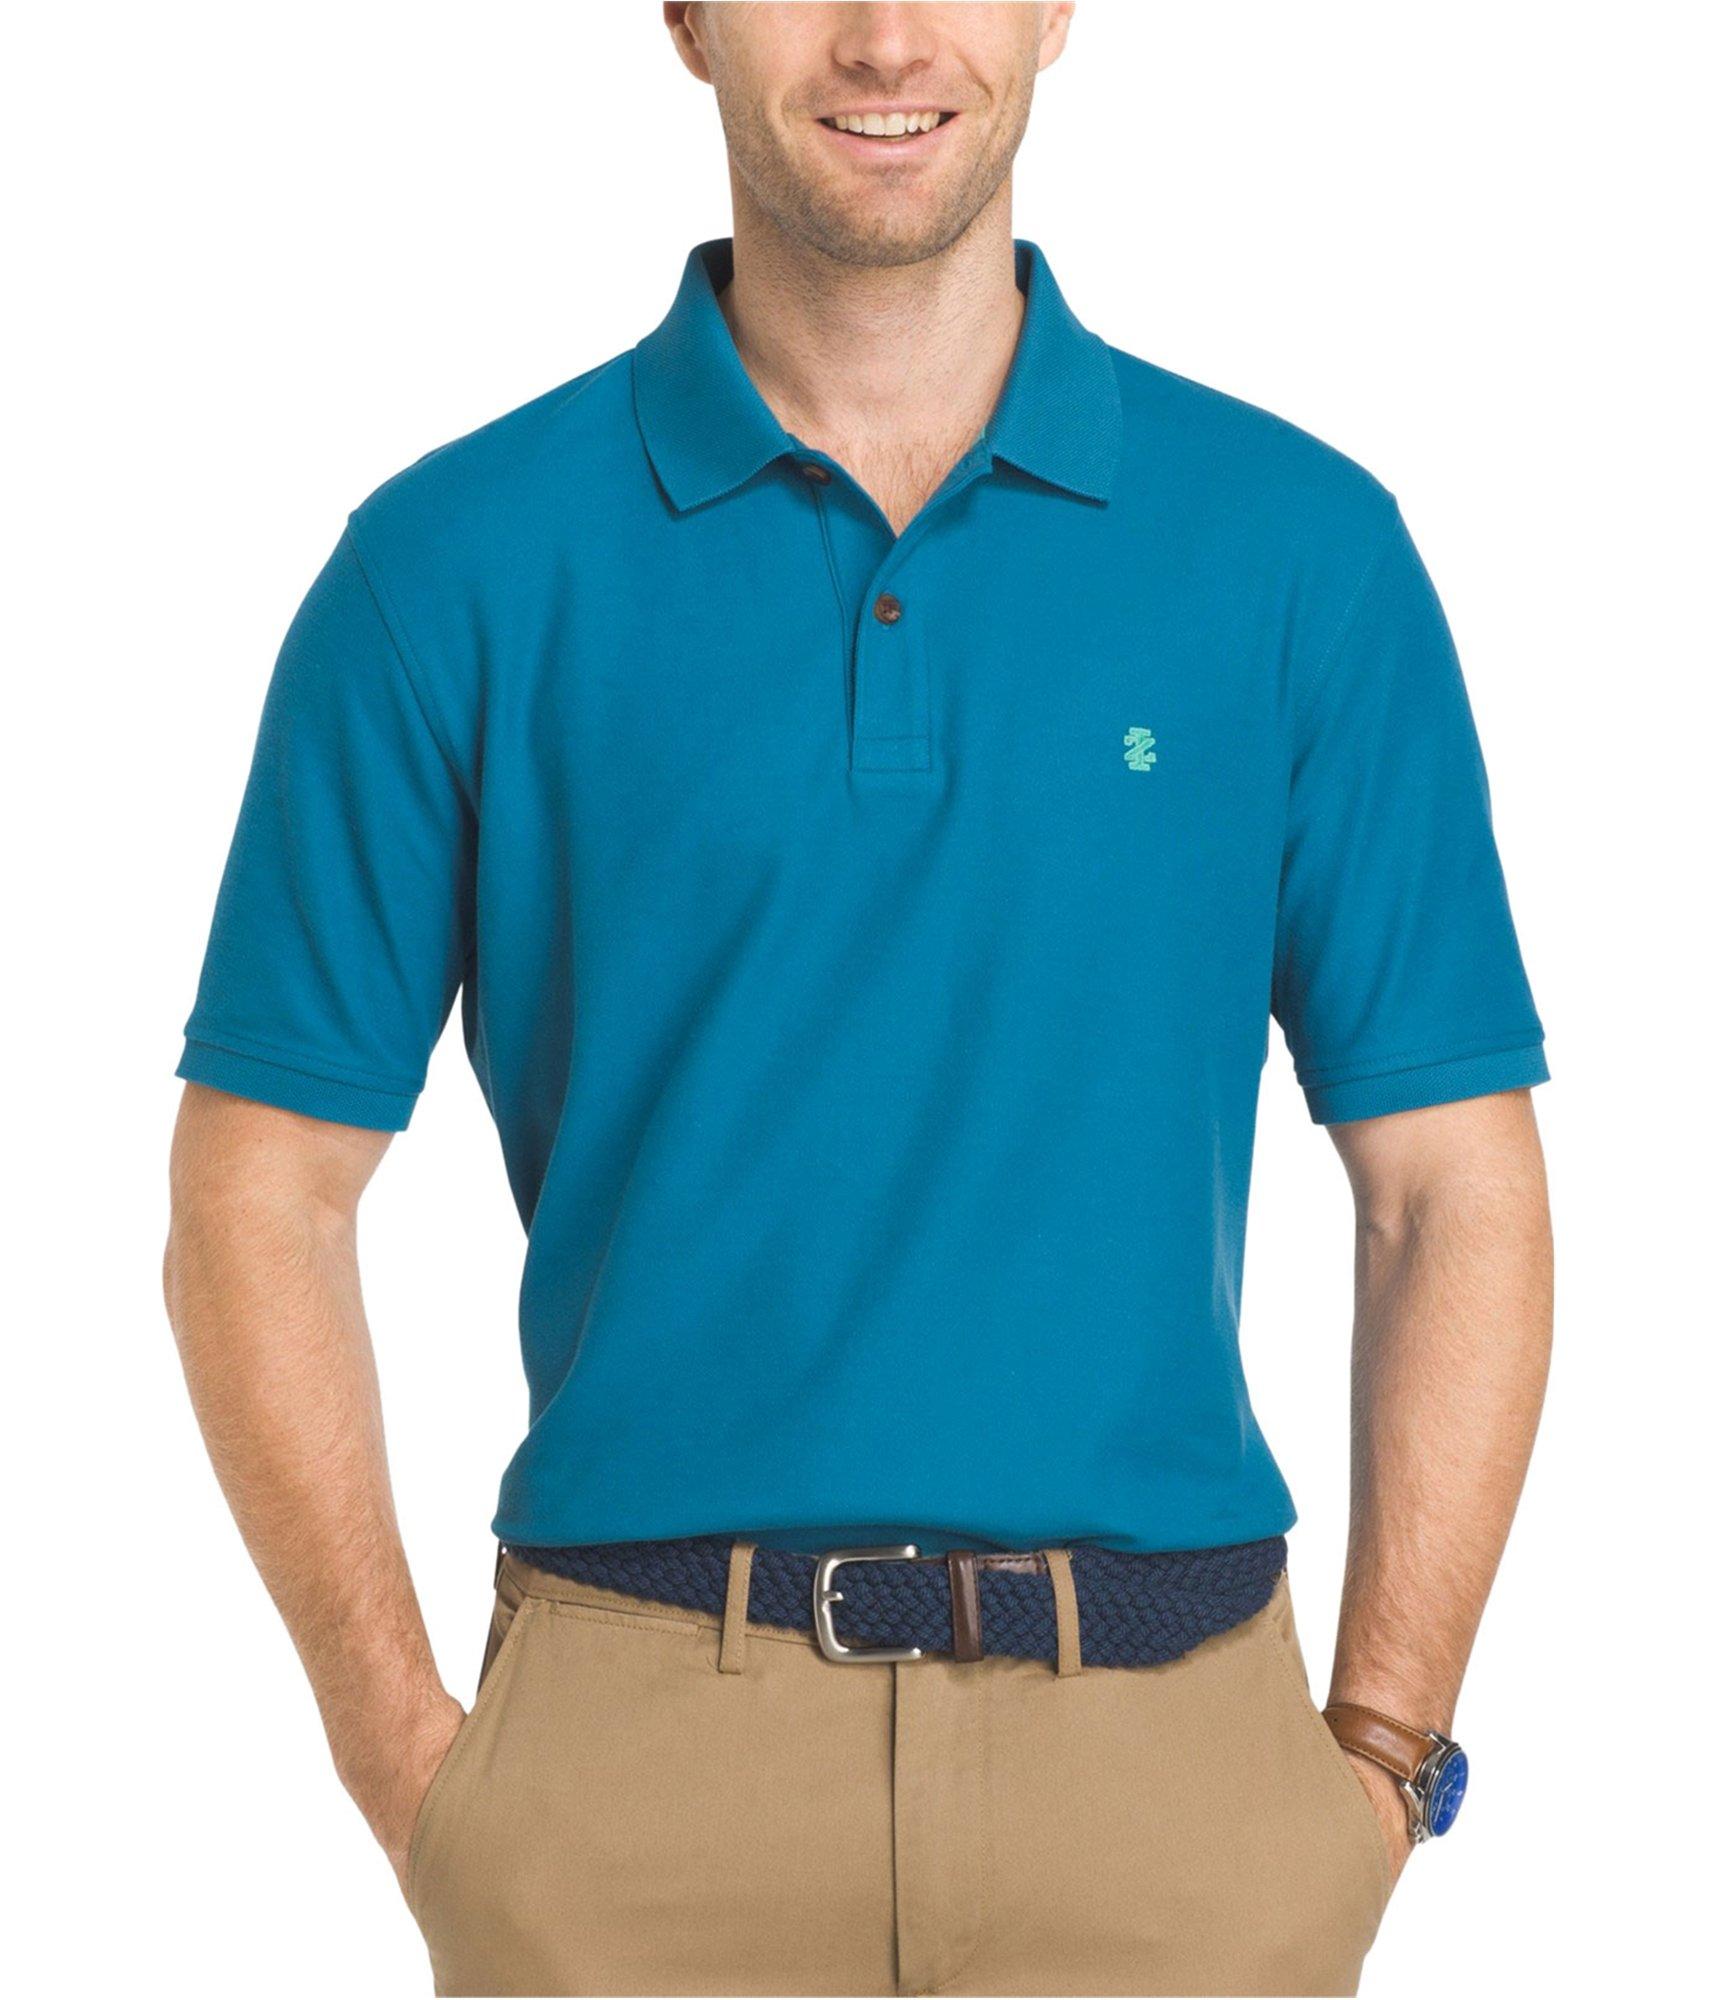 IZOD Men's Advantage Performance Solid Polo (Regular and Slim Fit), Saxony Blue, S